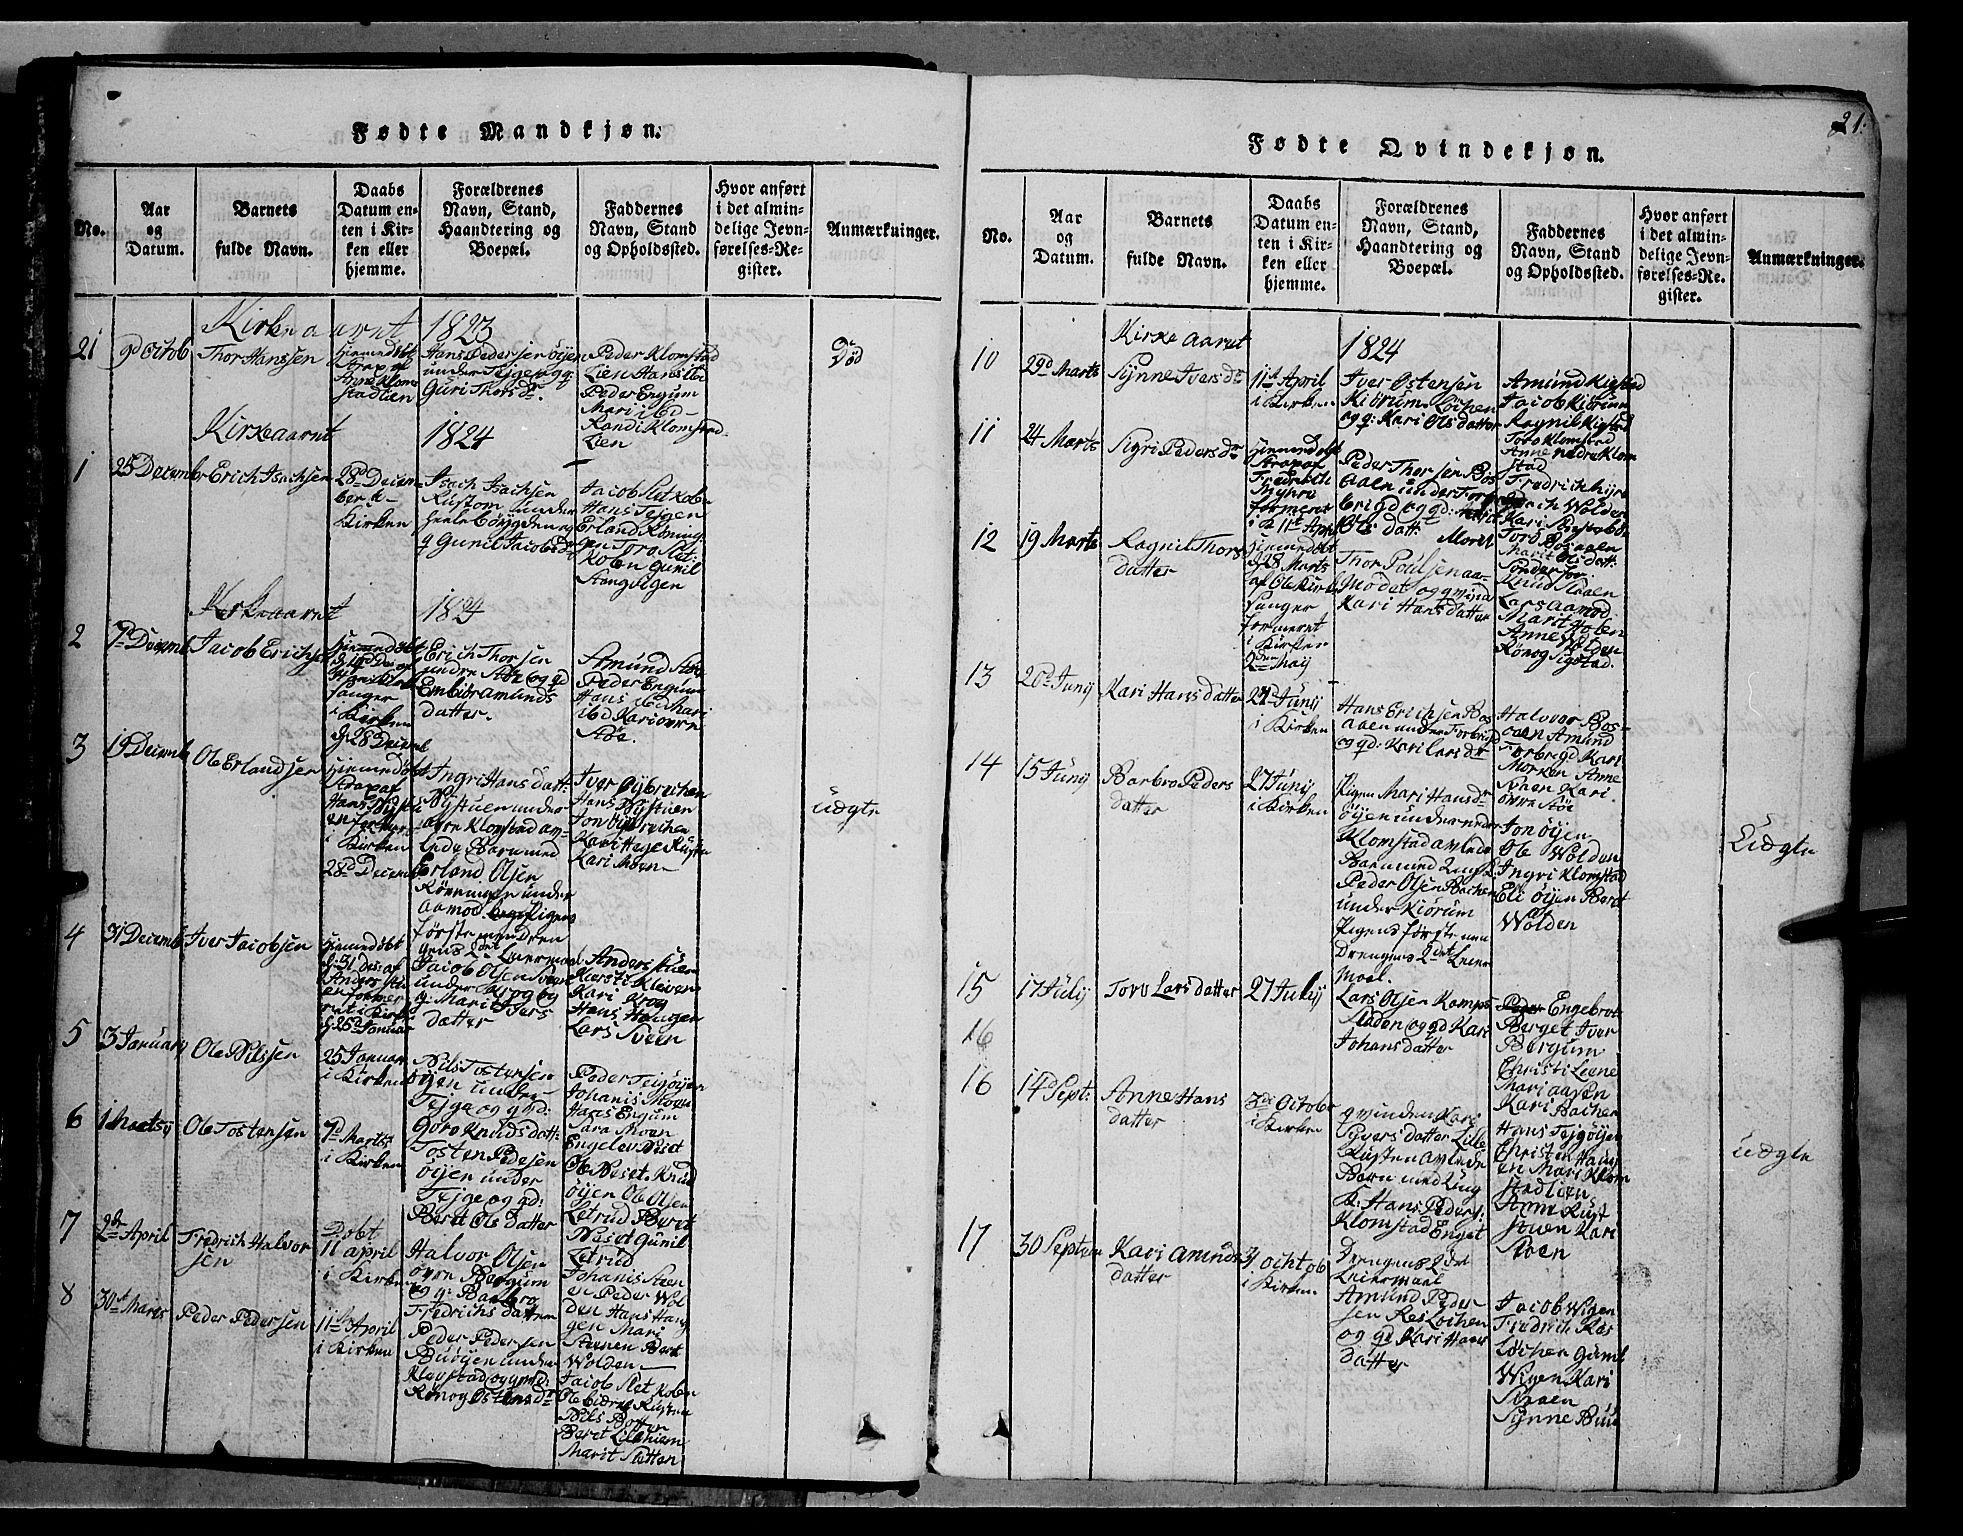 SAH, Fron prestekontor, H/Ha/Hab/L0002: Klokkerbok nr. 2, 1816-1850, s. 21